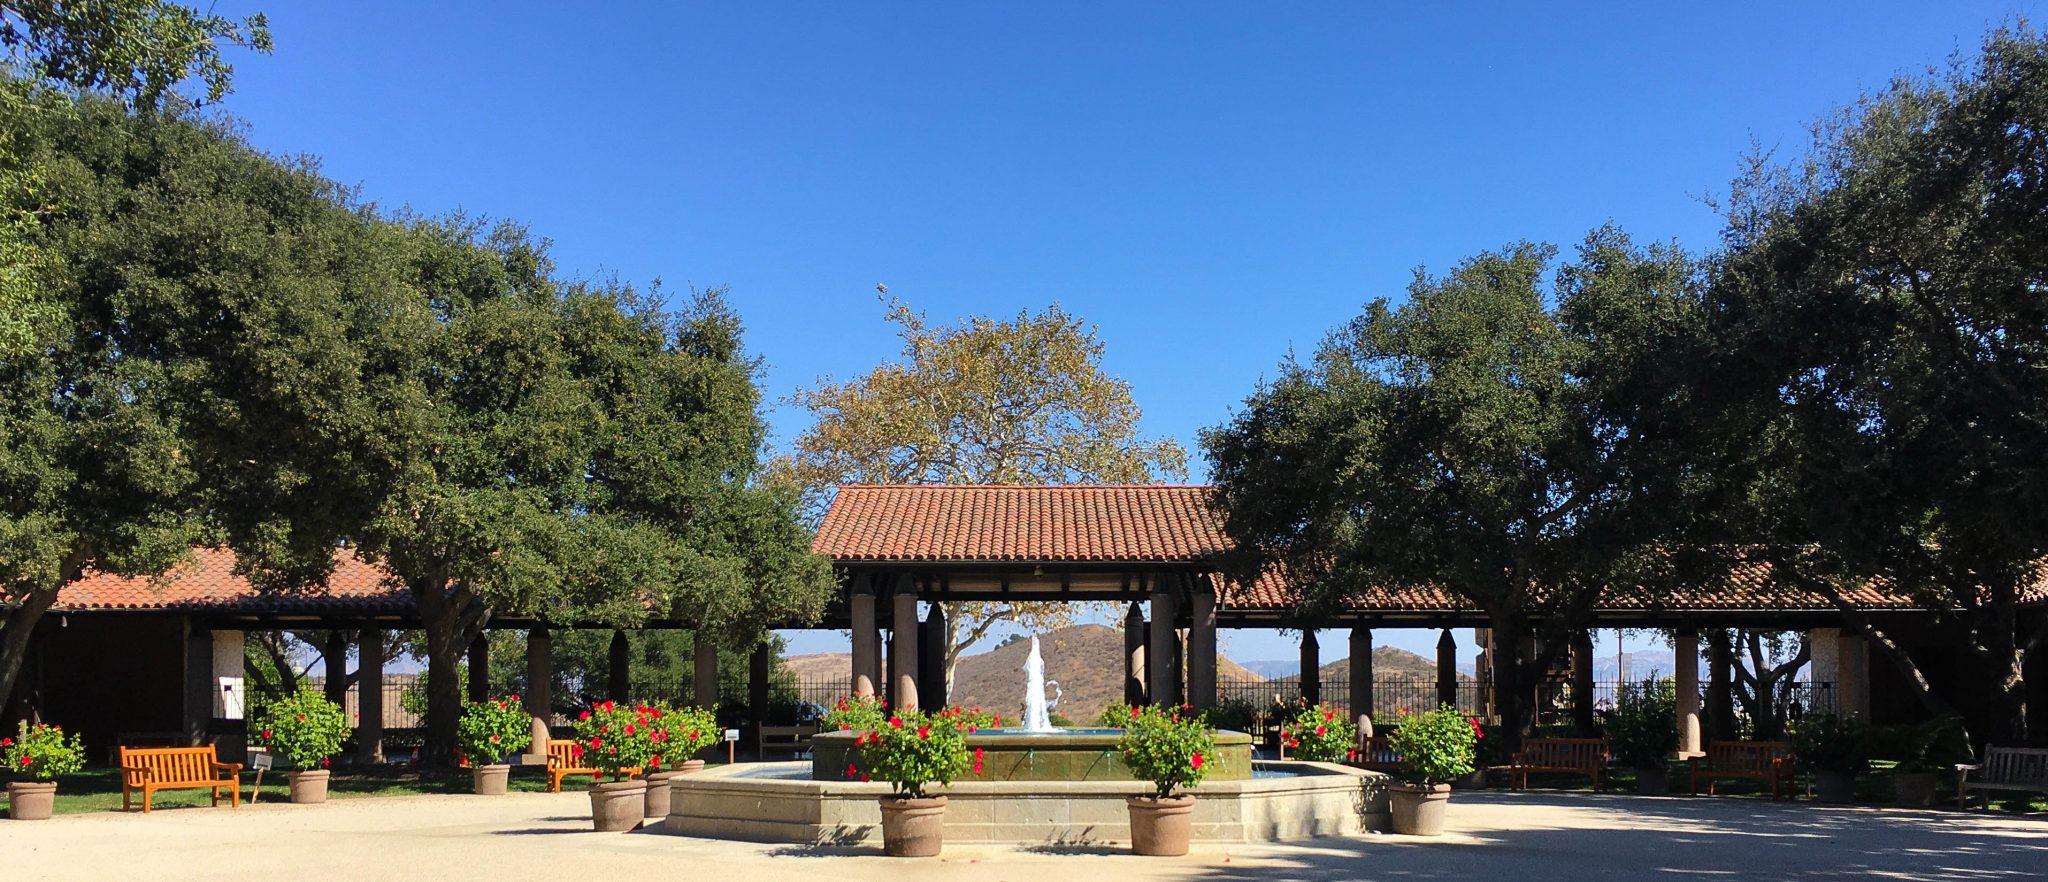 Reagan Library in Simi Valley, California